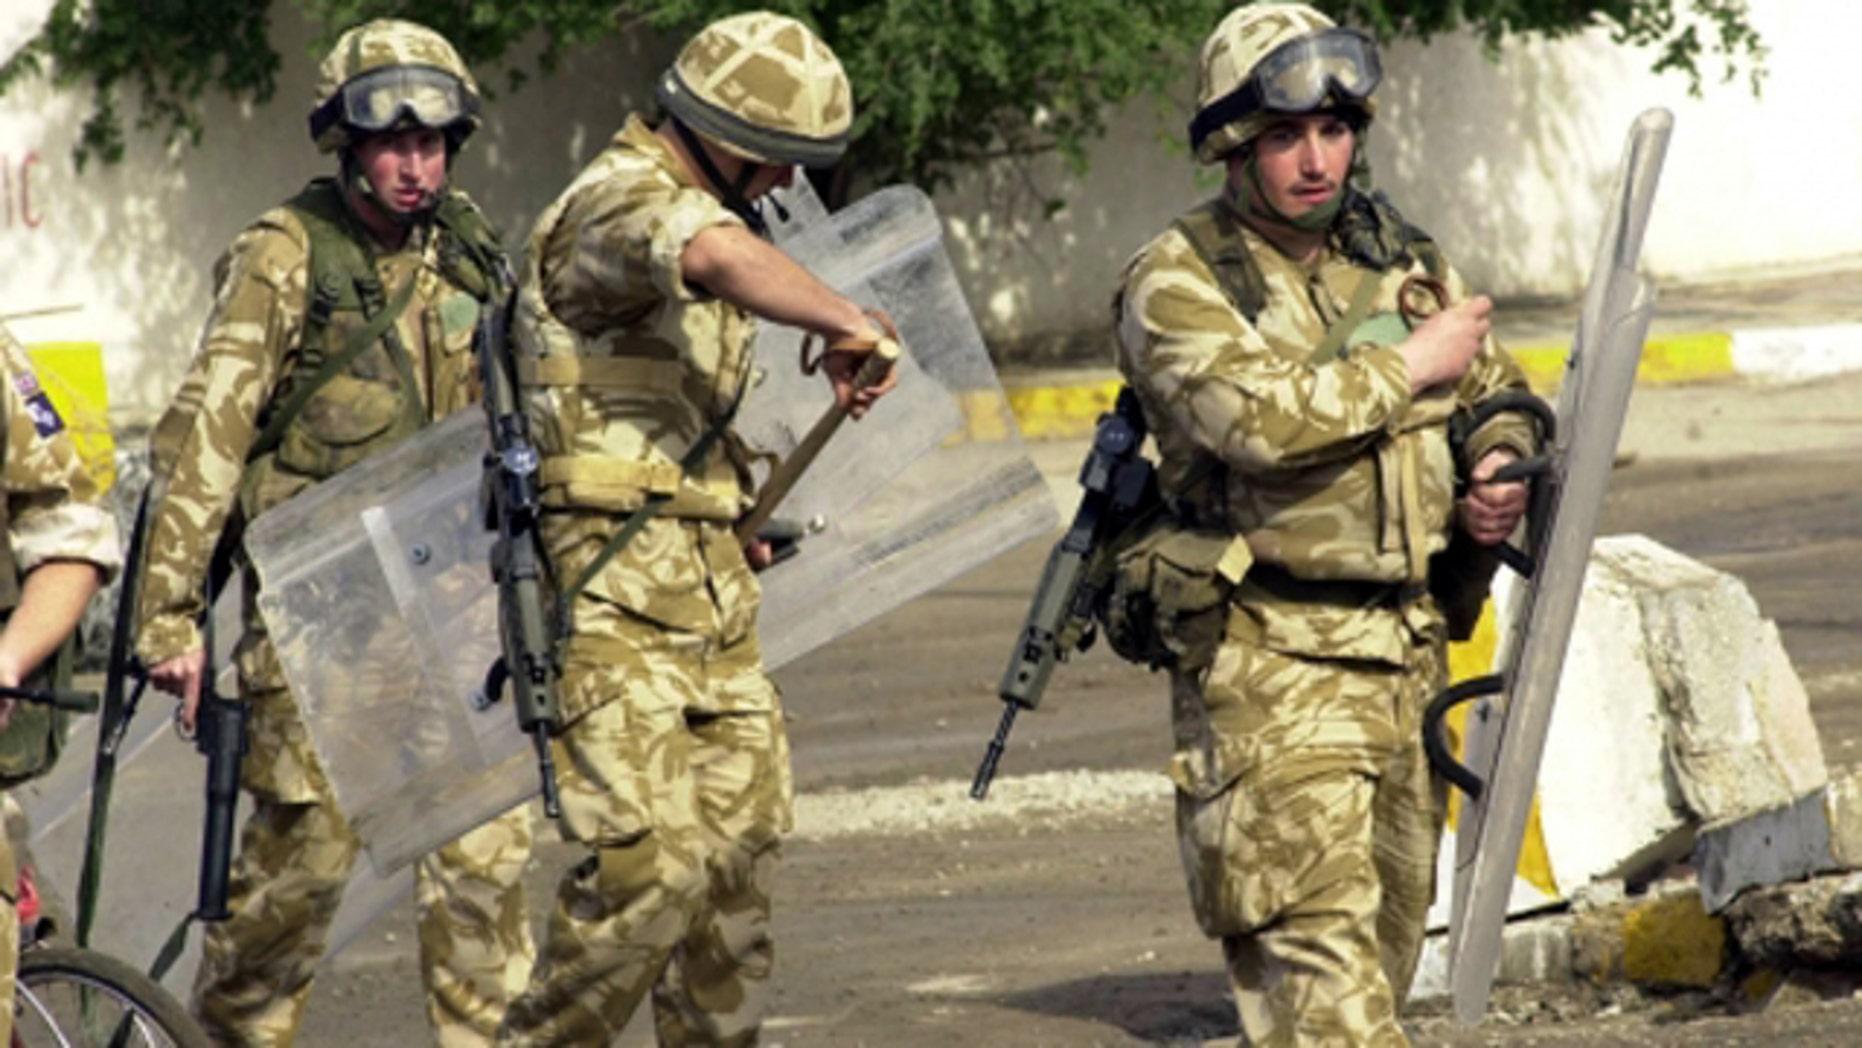 British soldiers on patrol in Iraq in 2004. (AP)